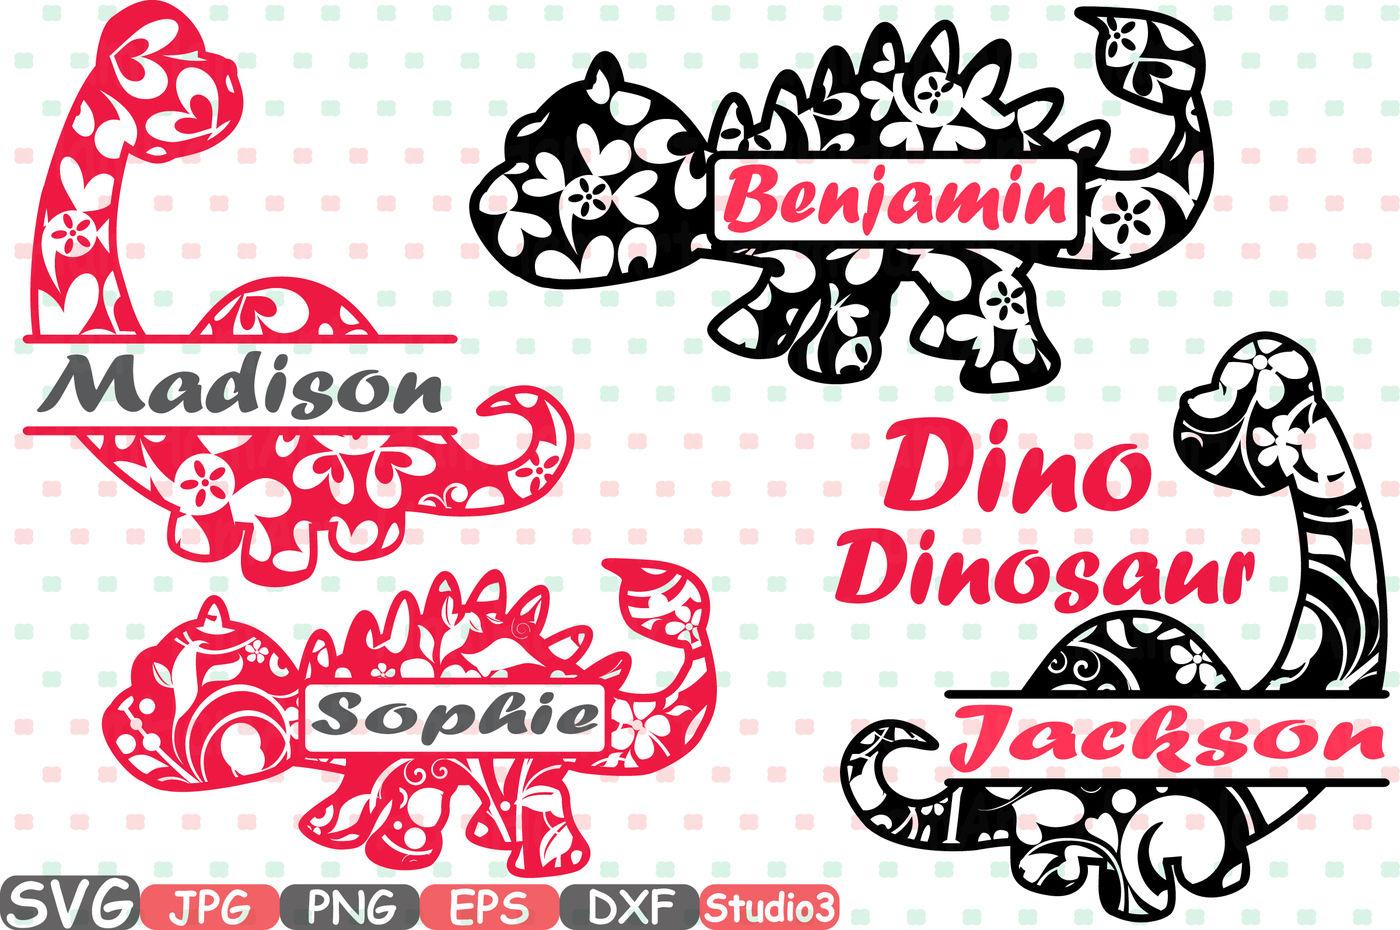 Split Dinosaur Frames Dinos Floral Flower Svg Silhouette Cricut